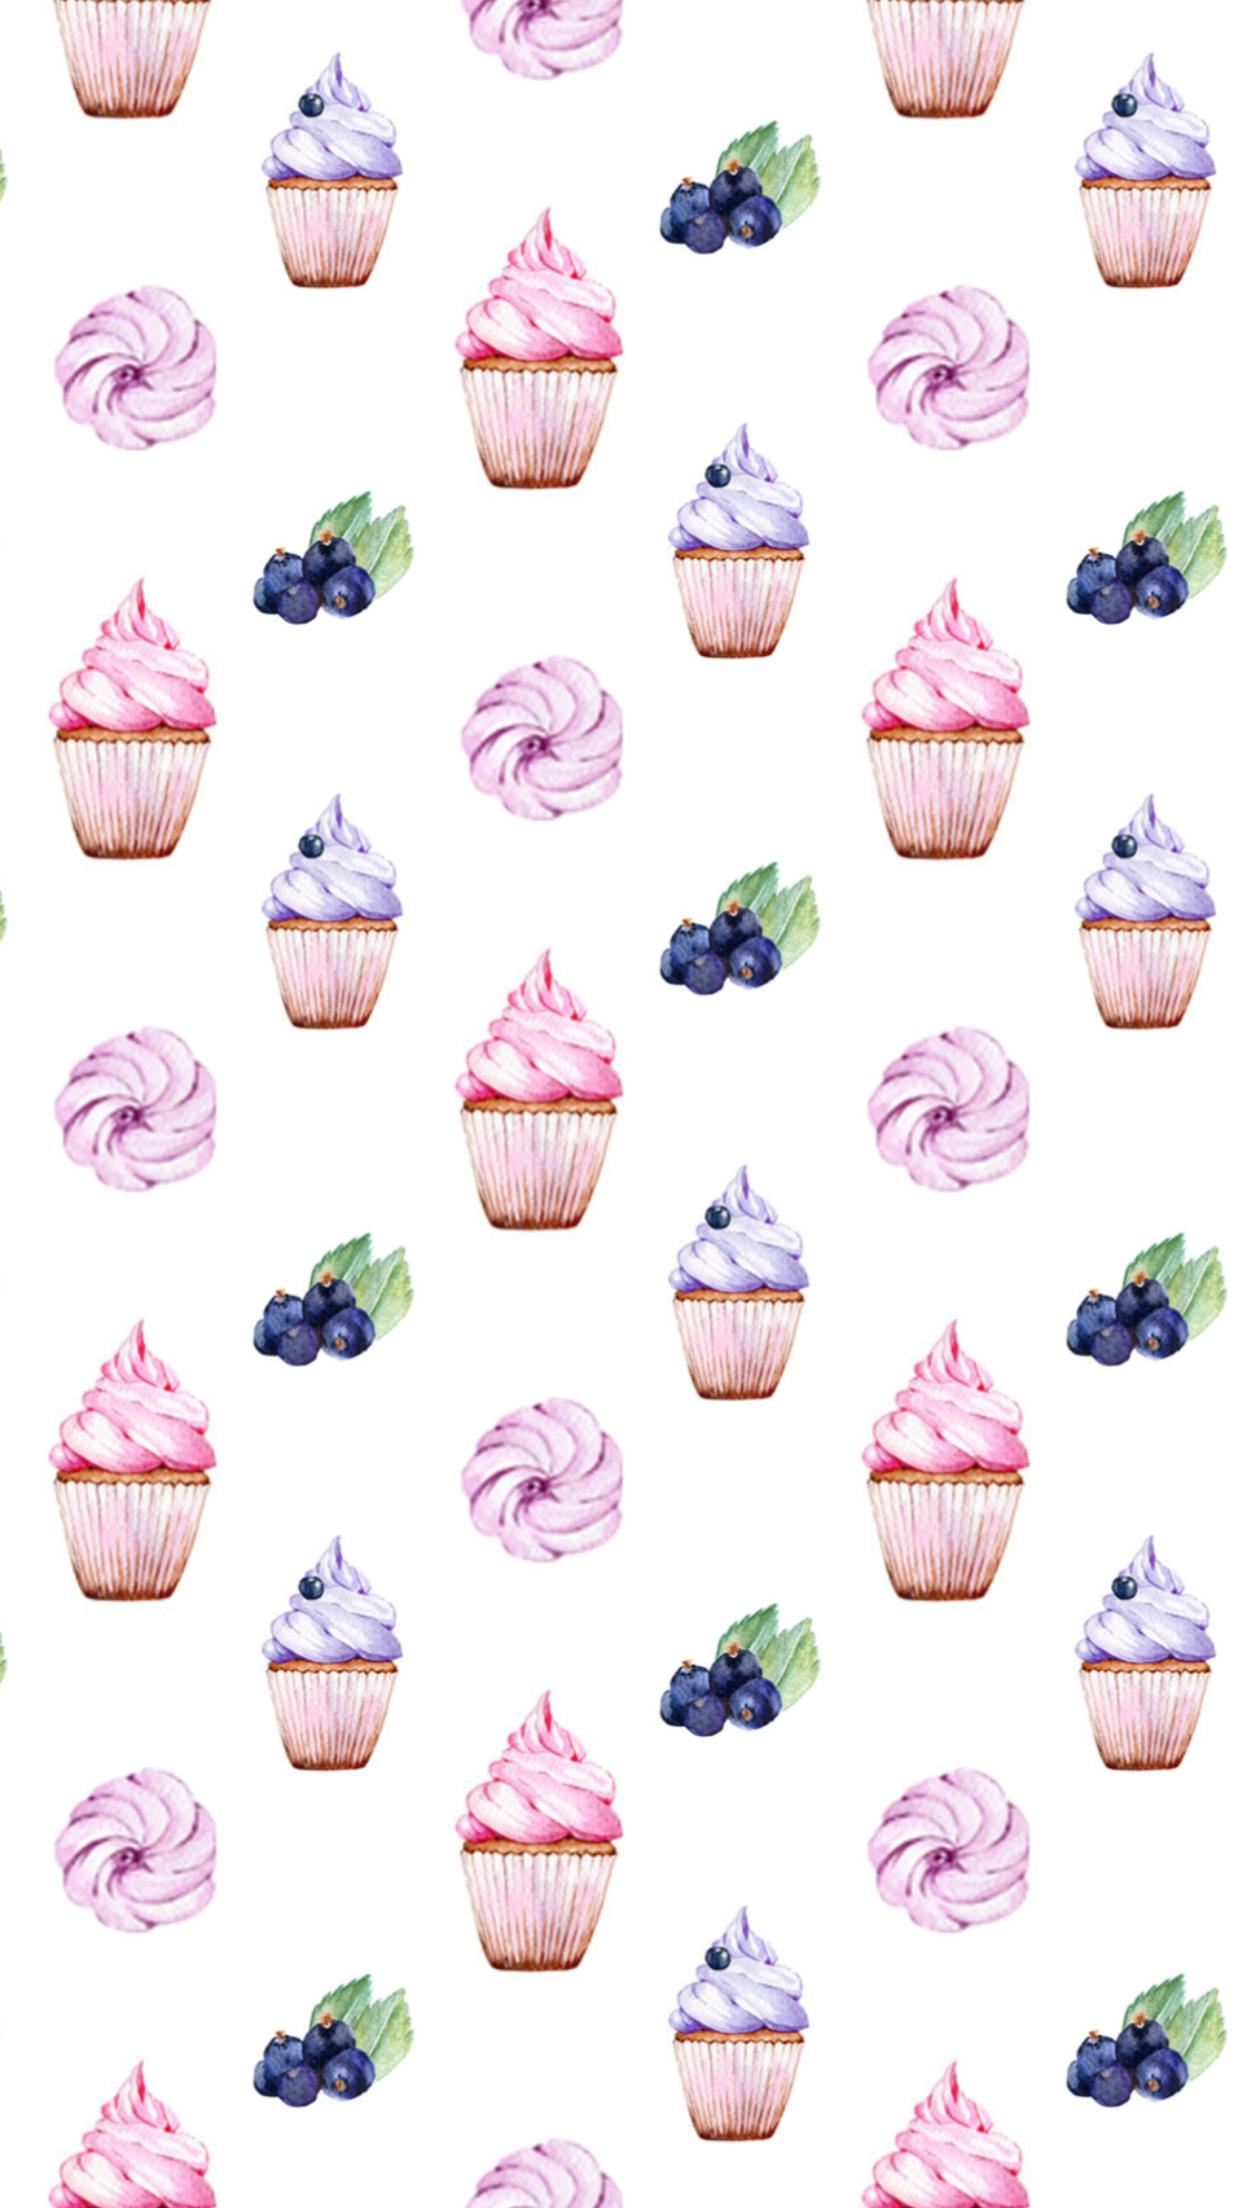 Cupcakes Blues Berry Prints Vintage Paper Wallpaper